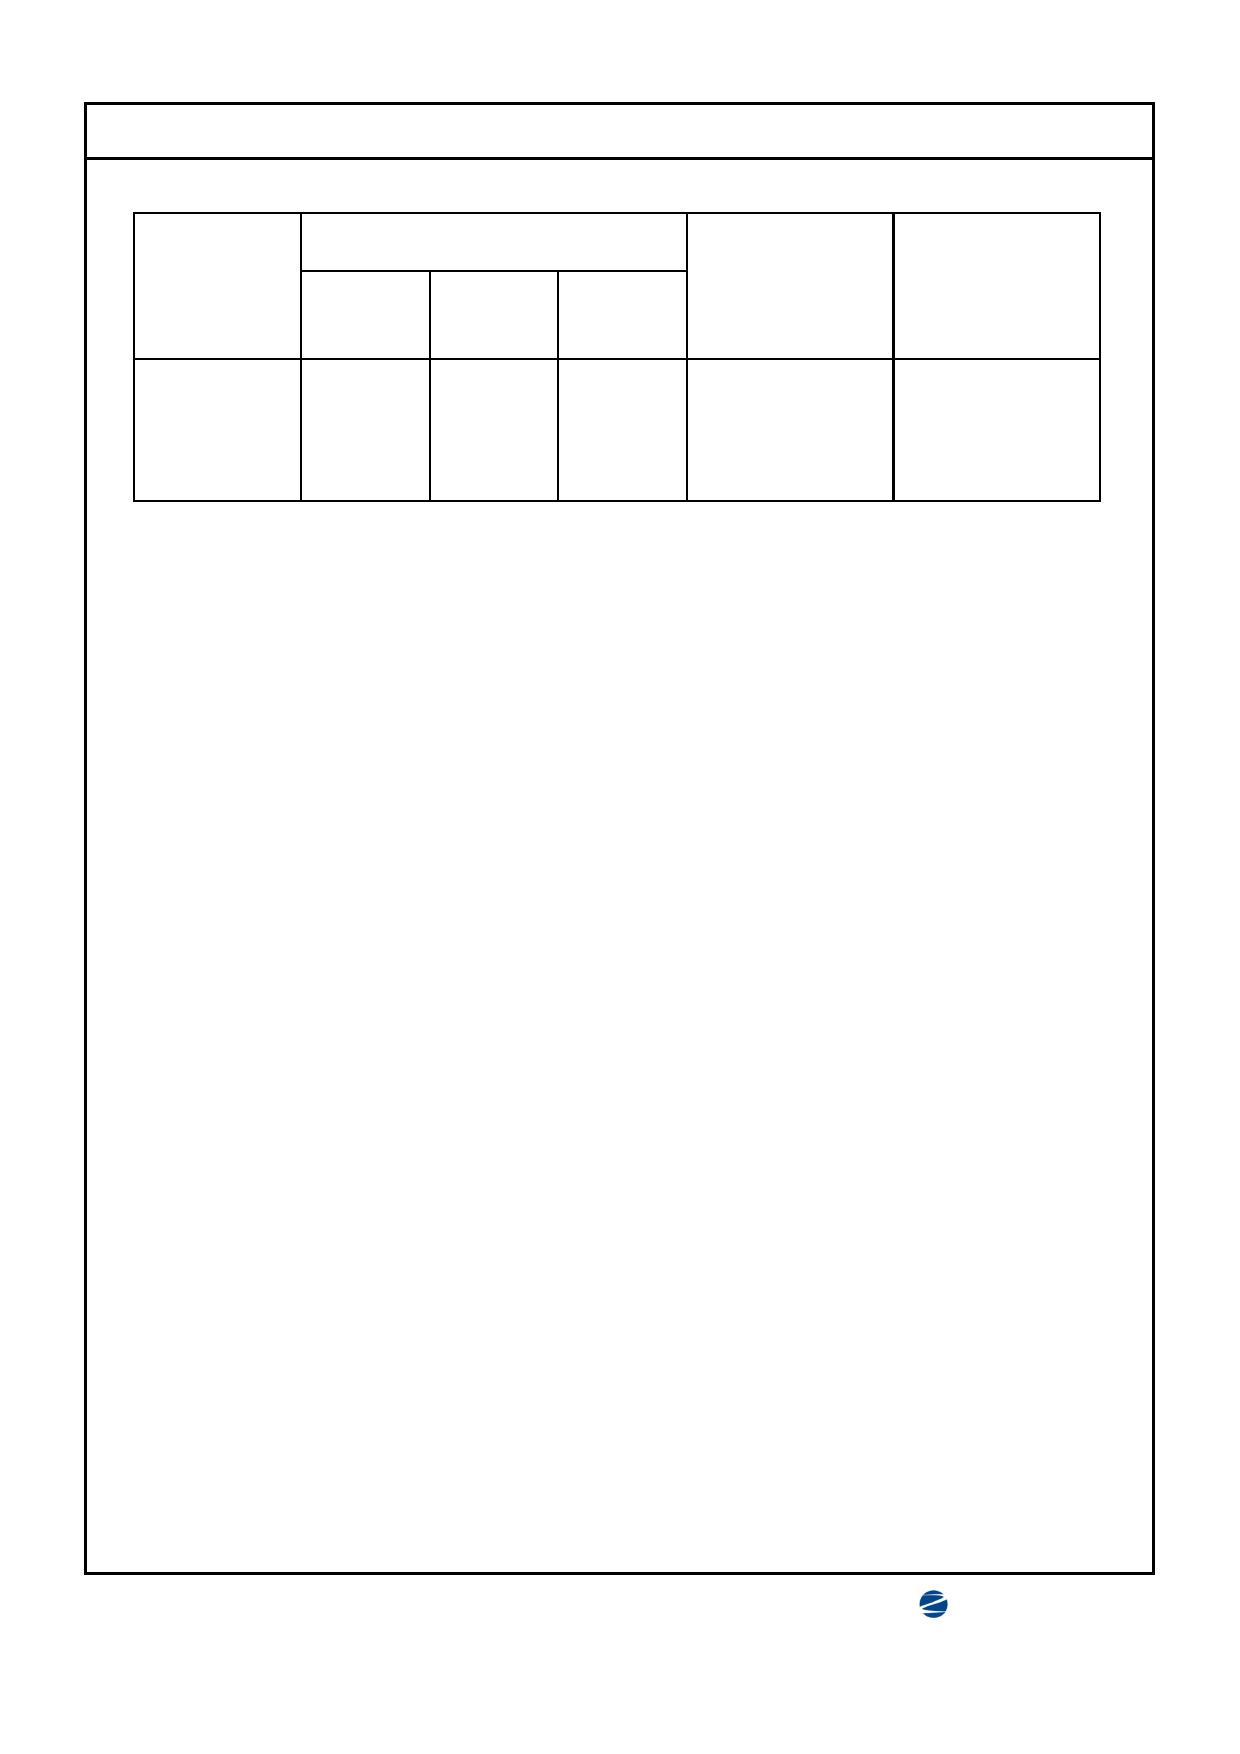 MBR10100CFSH pdf, ピン配列